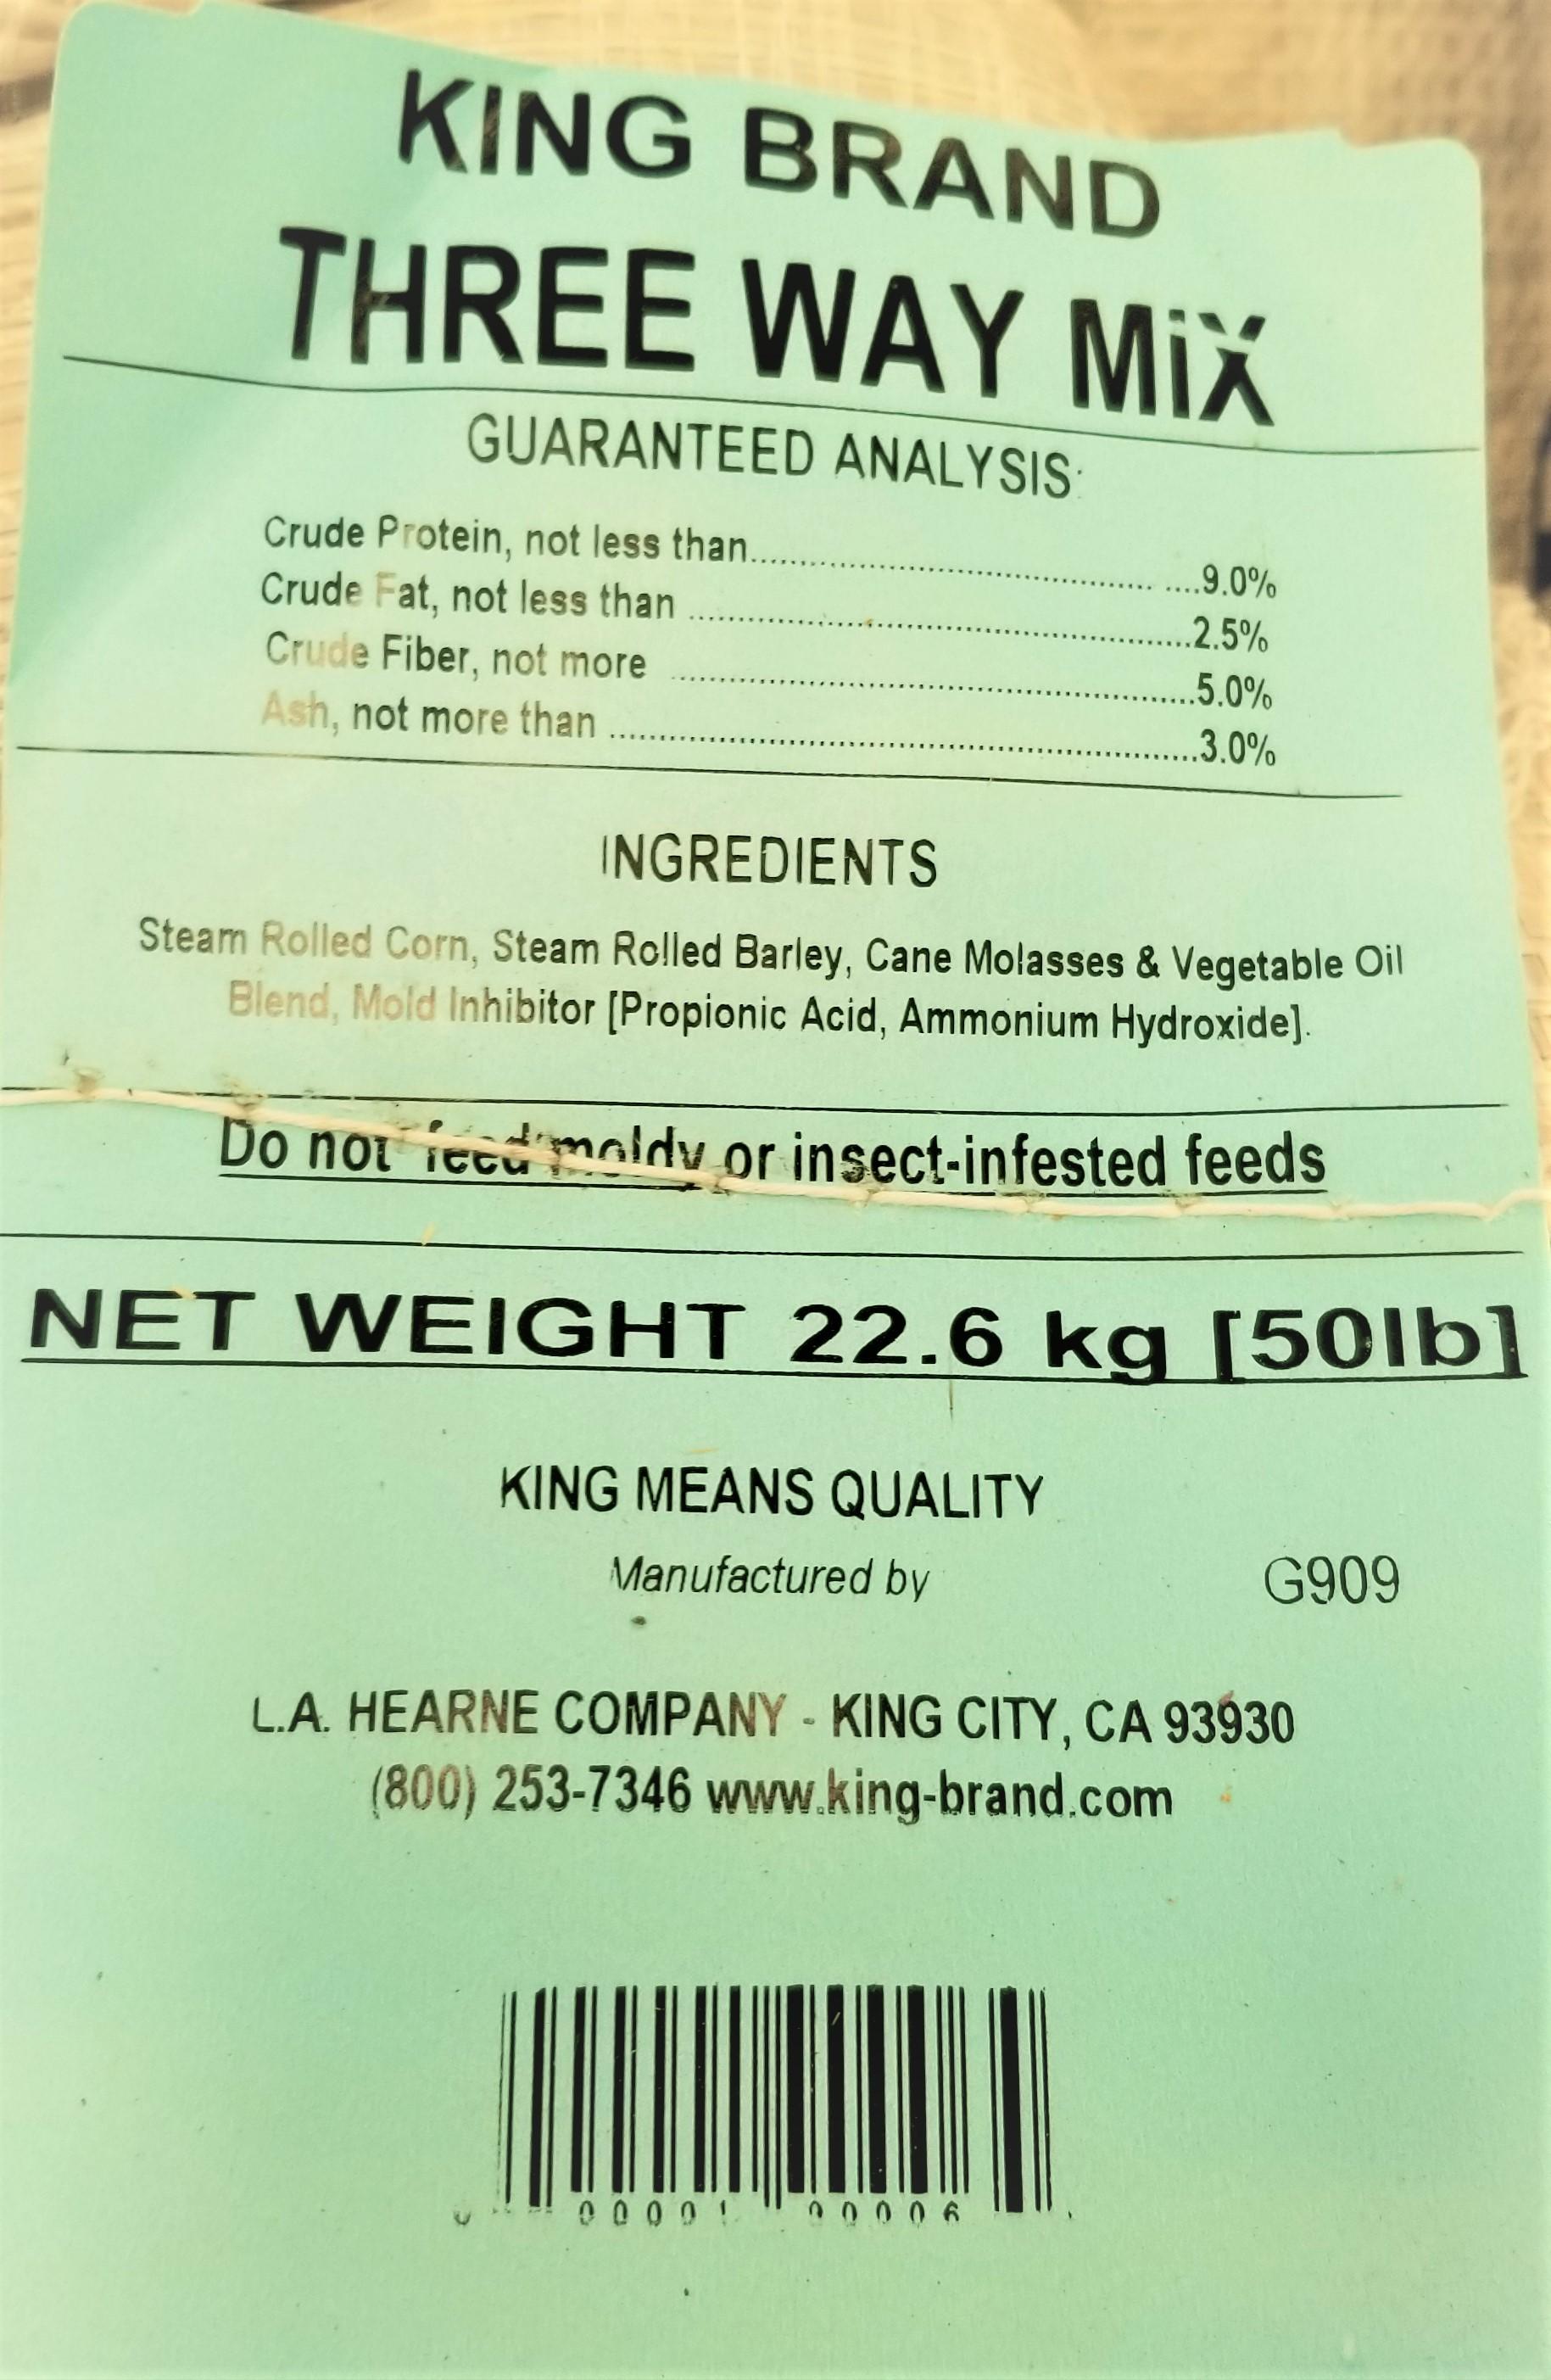 grain-king-three-way-mix-feed-corn-barley-molasses-fd022008-50-lb.-12.39-detail-label.jpg